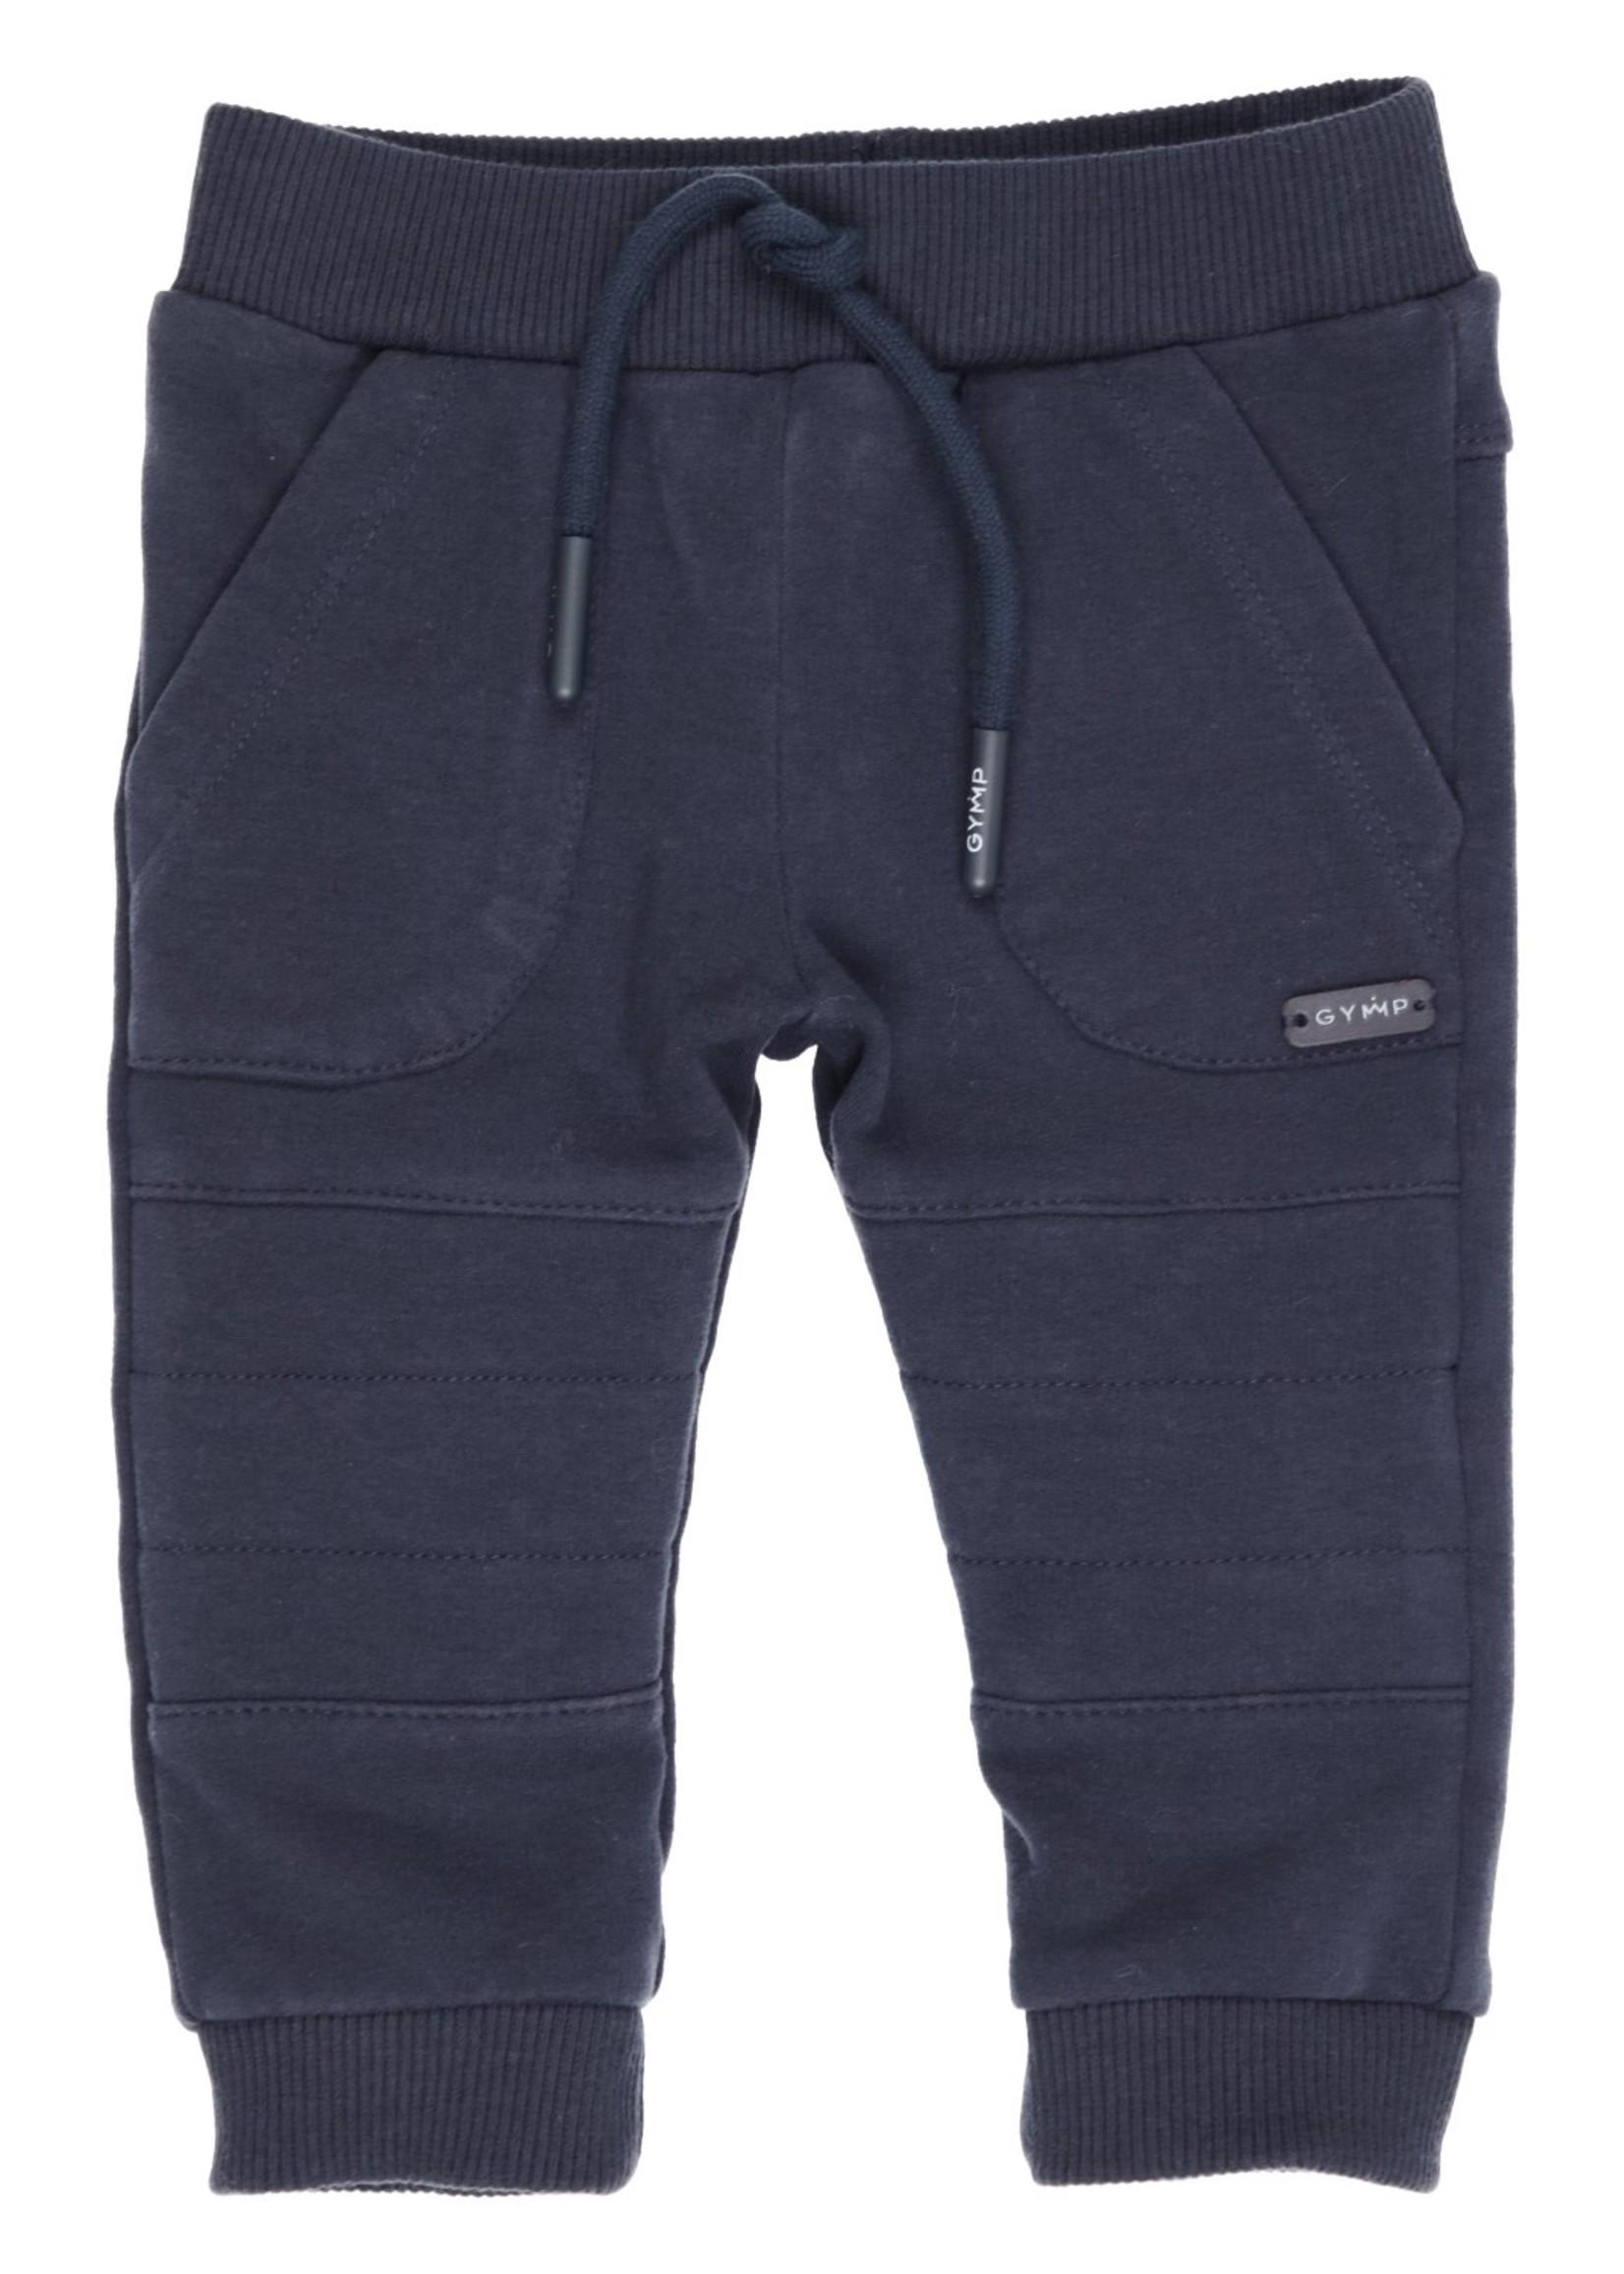 Gymp Gymp pants knee stitching marine